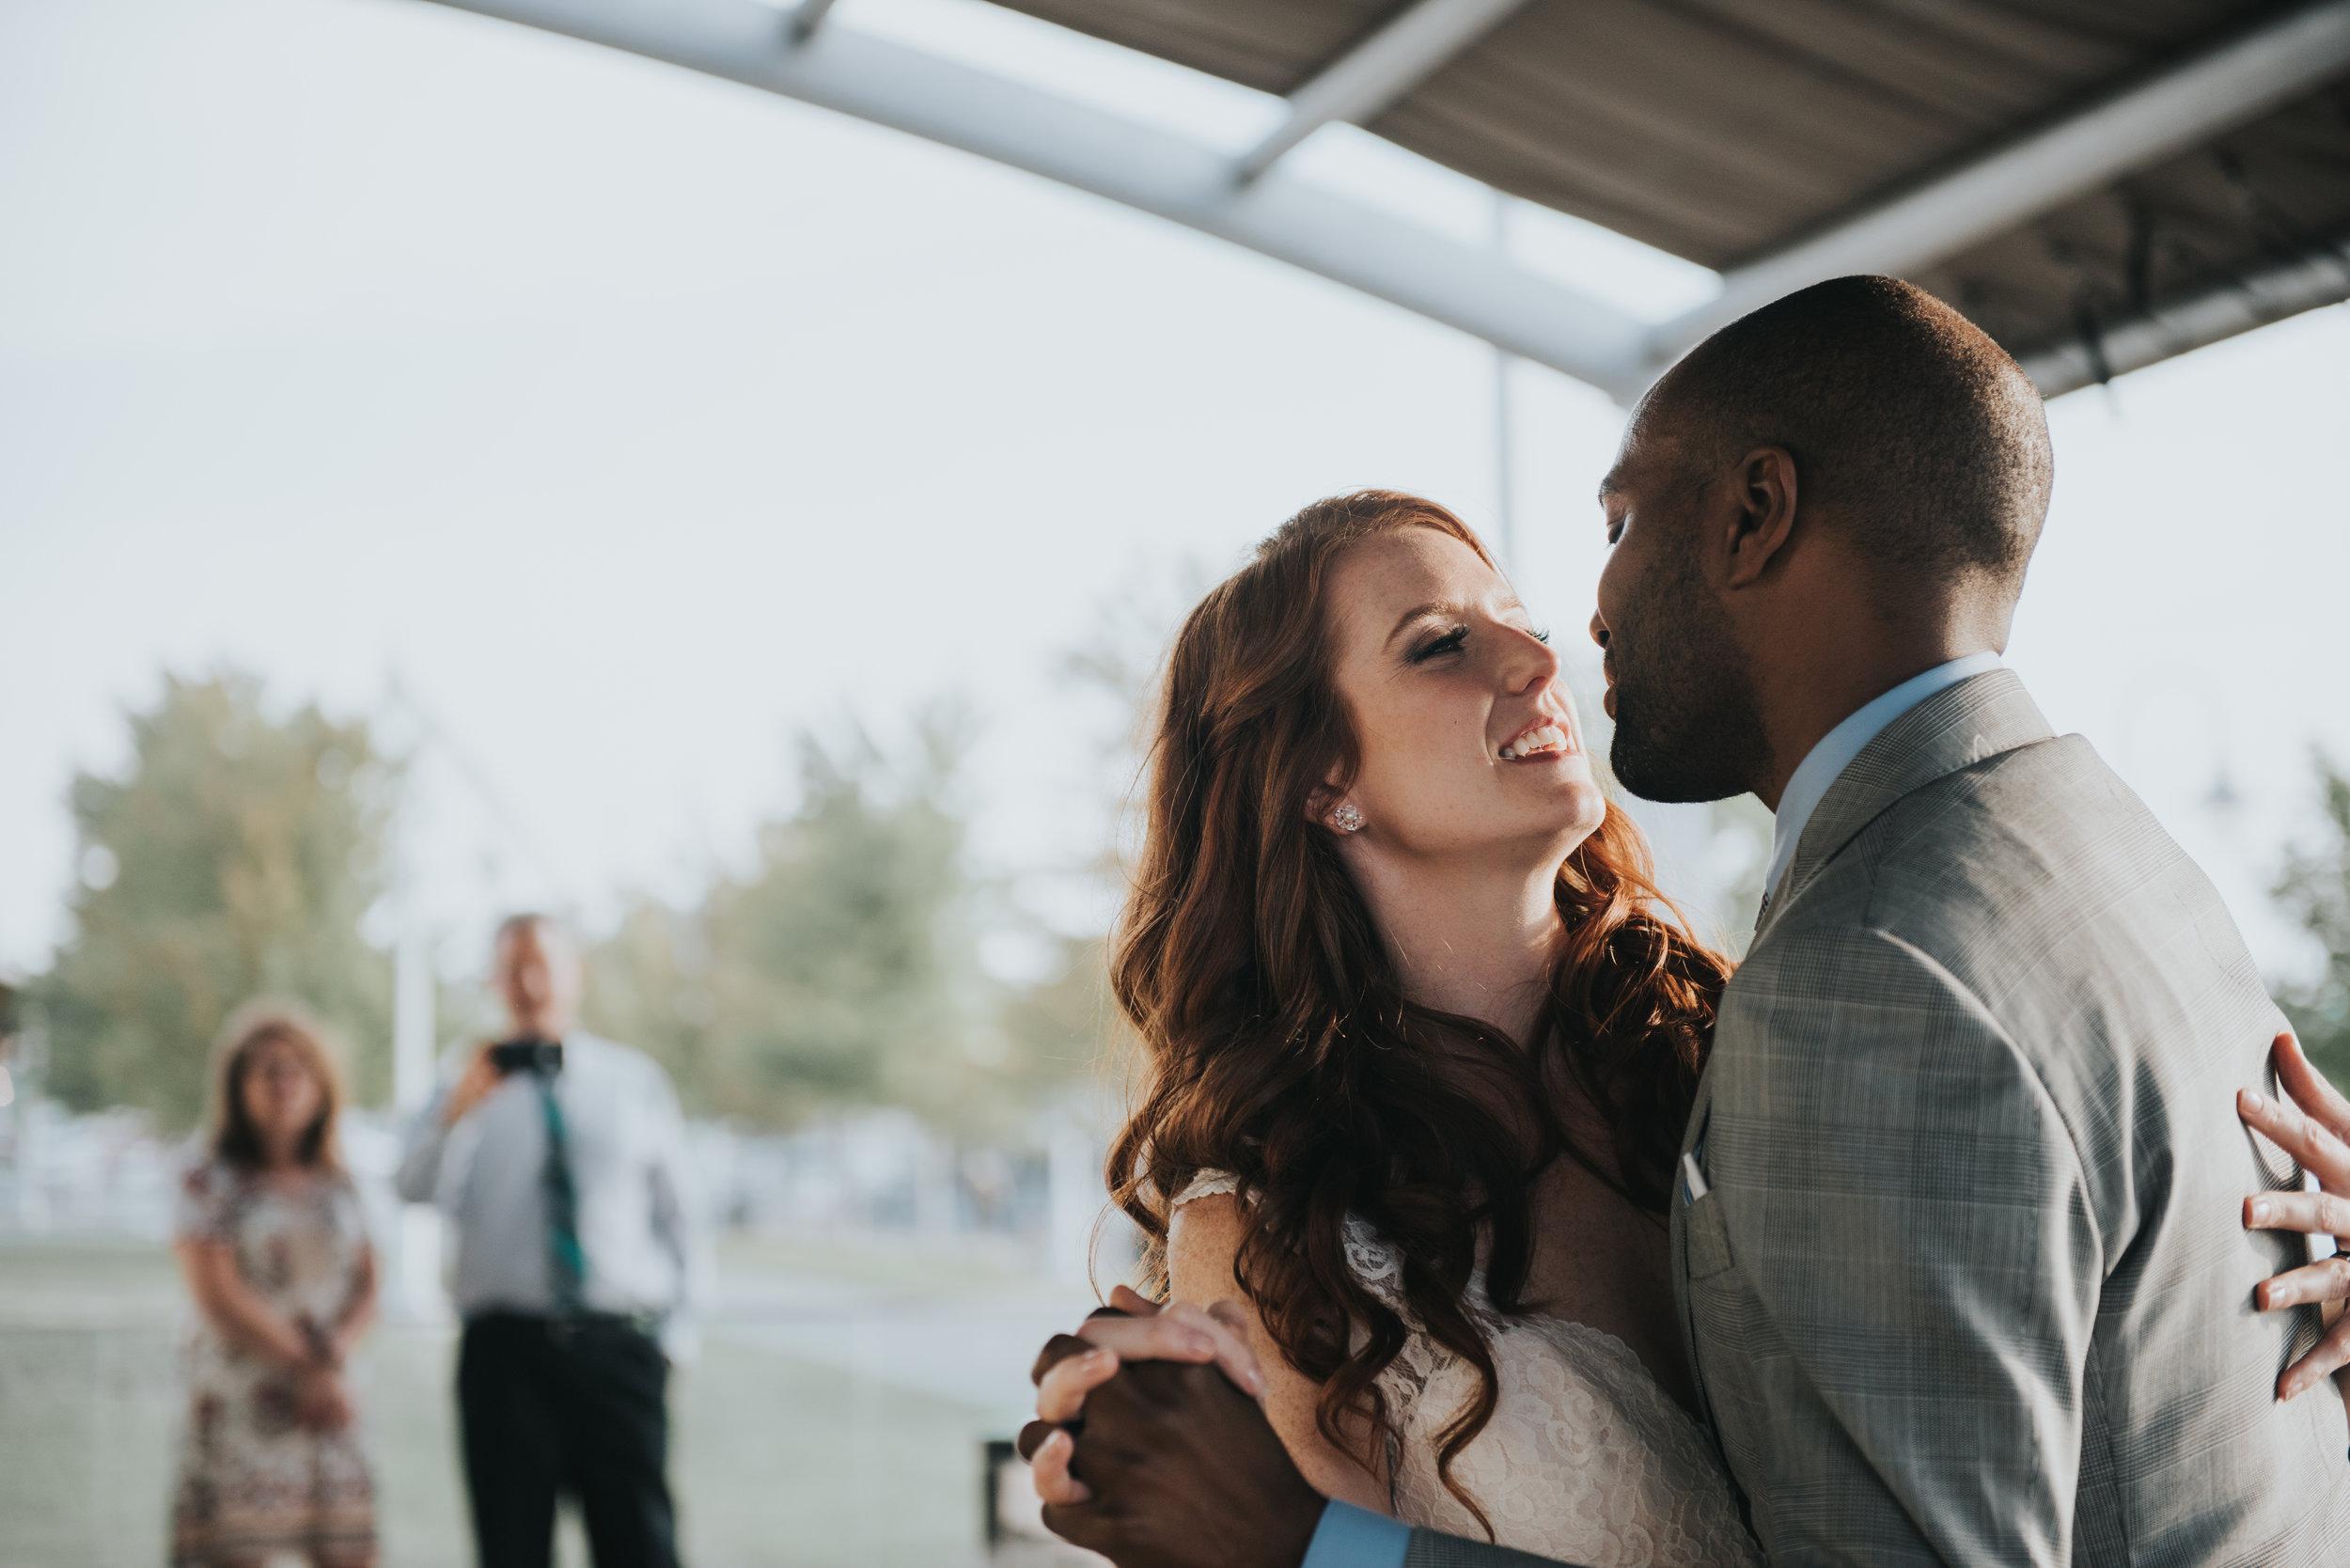 bride-groom-in-love-toronto-outdoor-summer-wedding-documentary-wedding-photography-by-willow-birch-photo.jpg